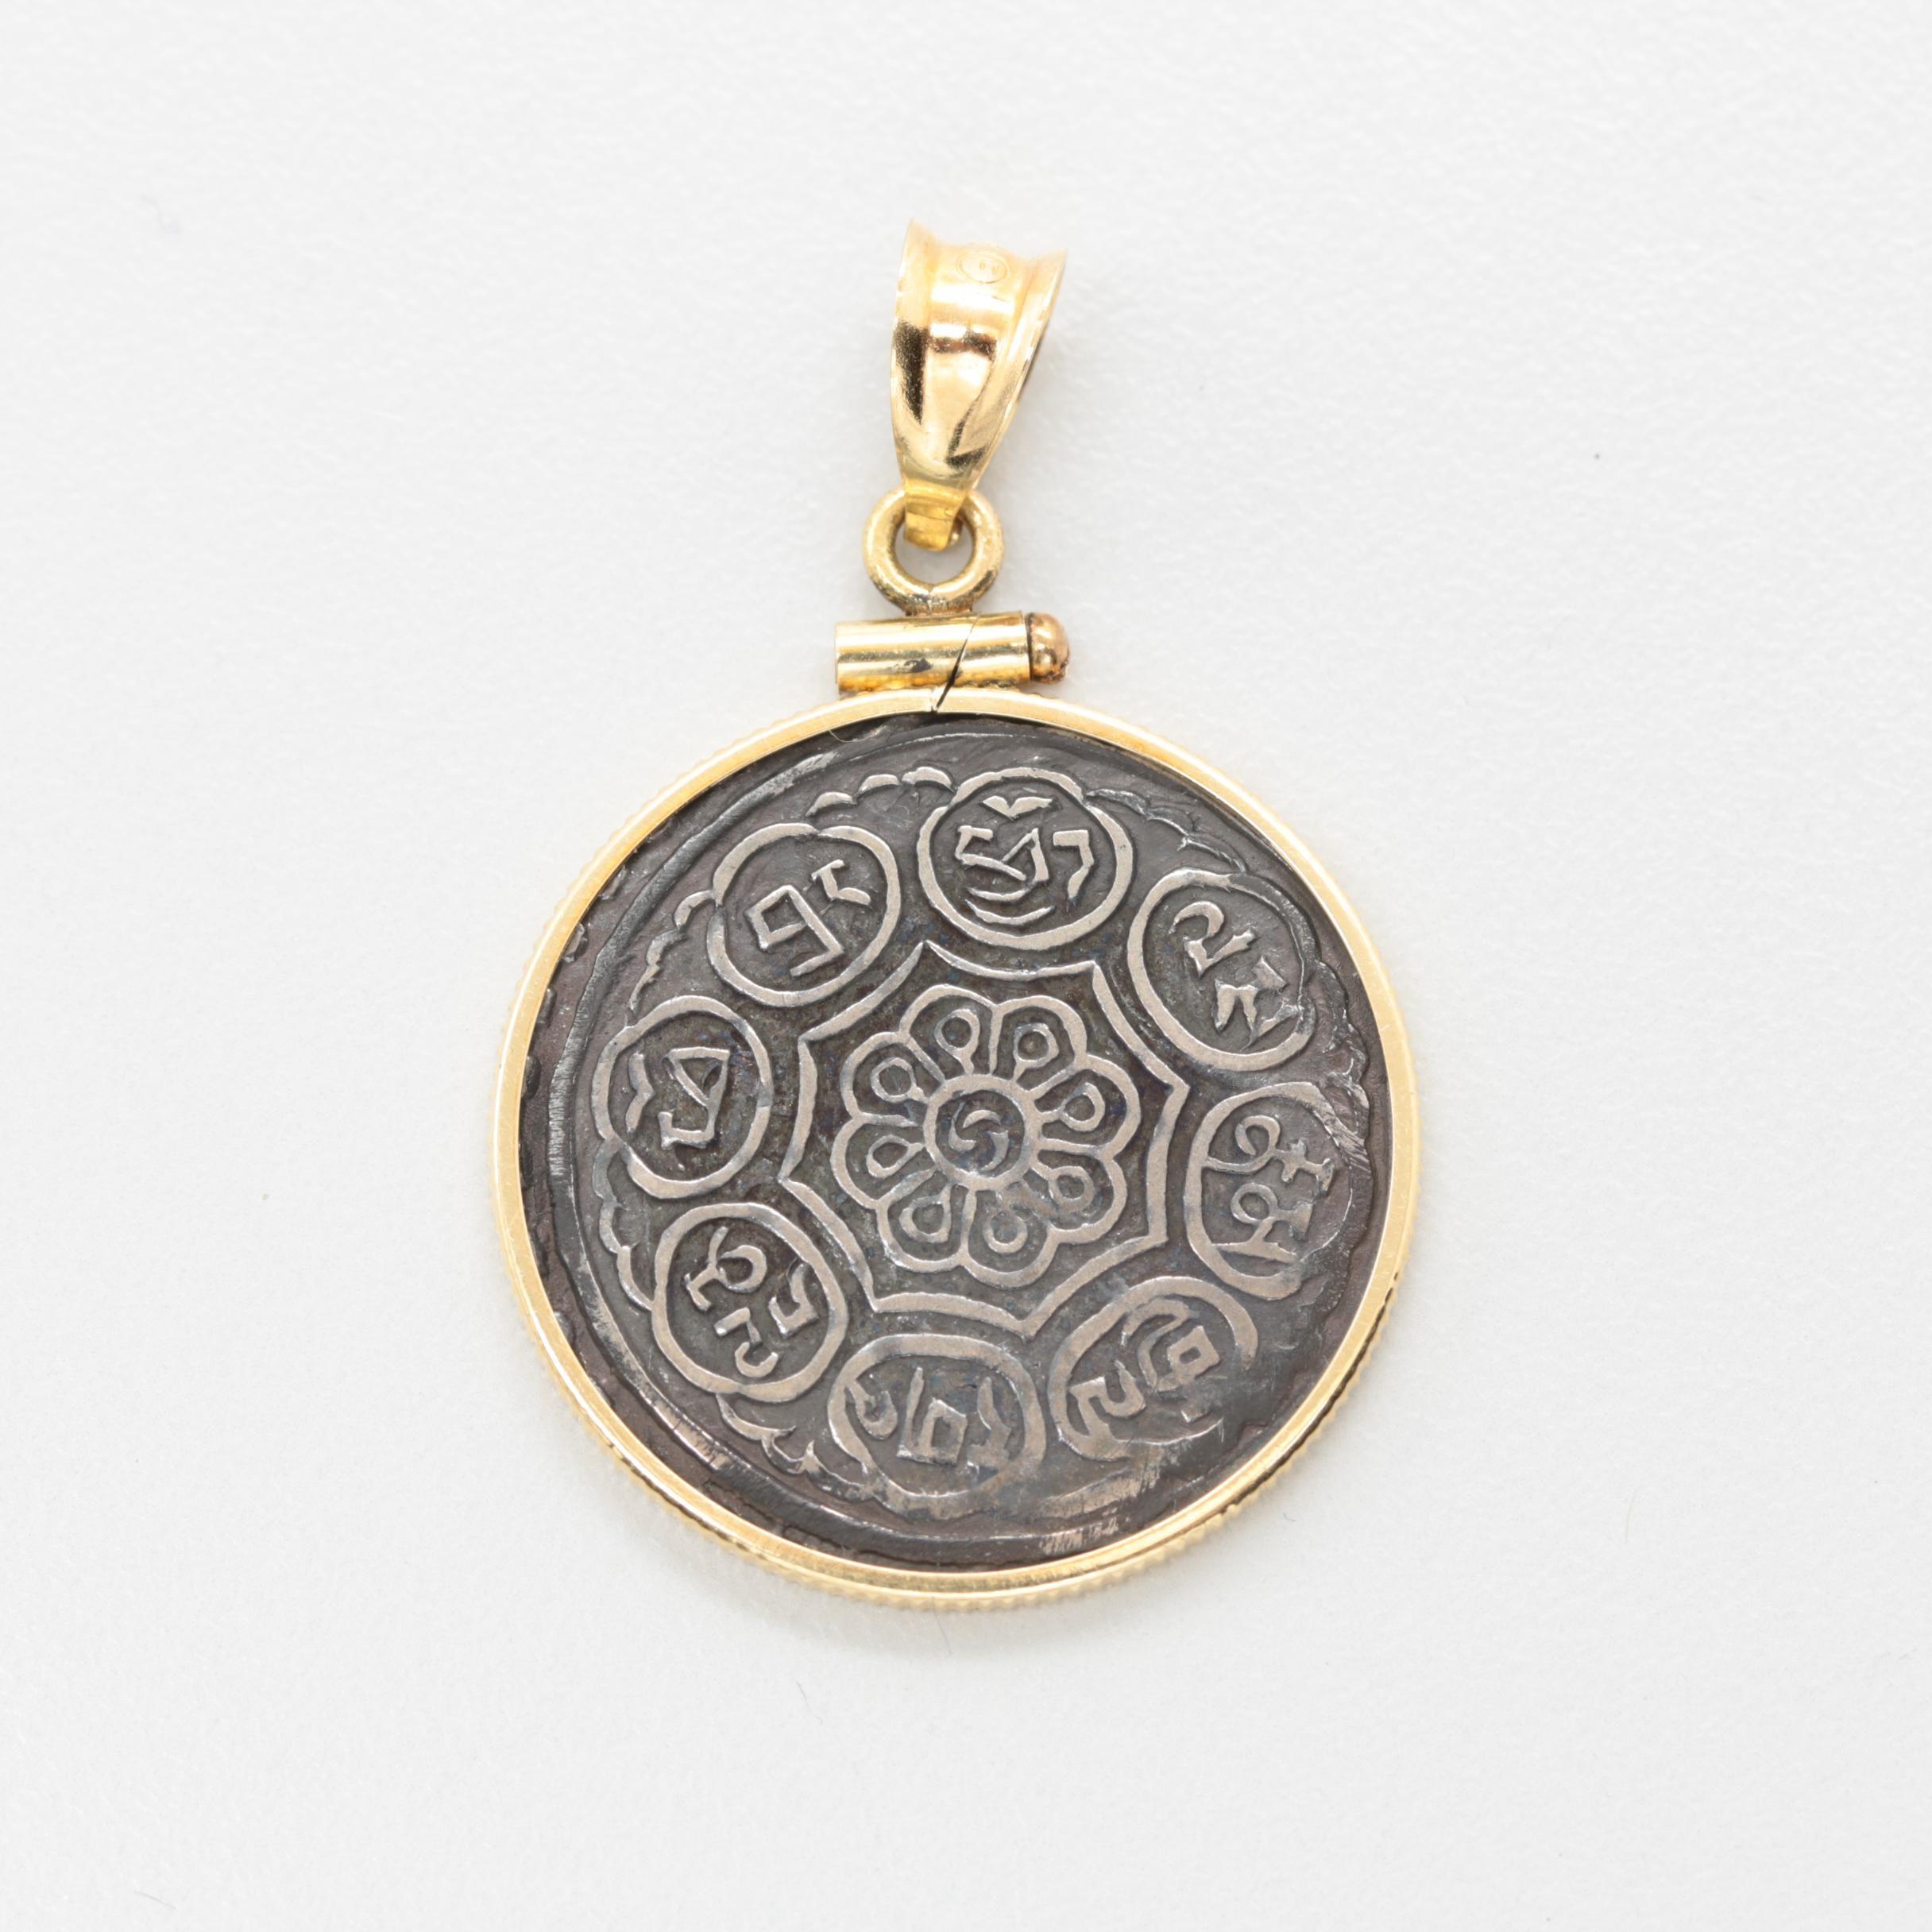 18K Yellow Gold Pendant with Late 19th Century Tibetan 1 Tangka Coin